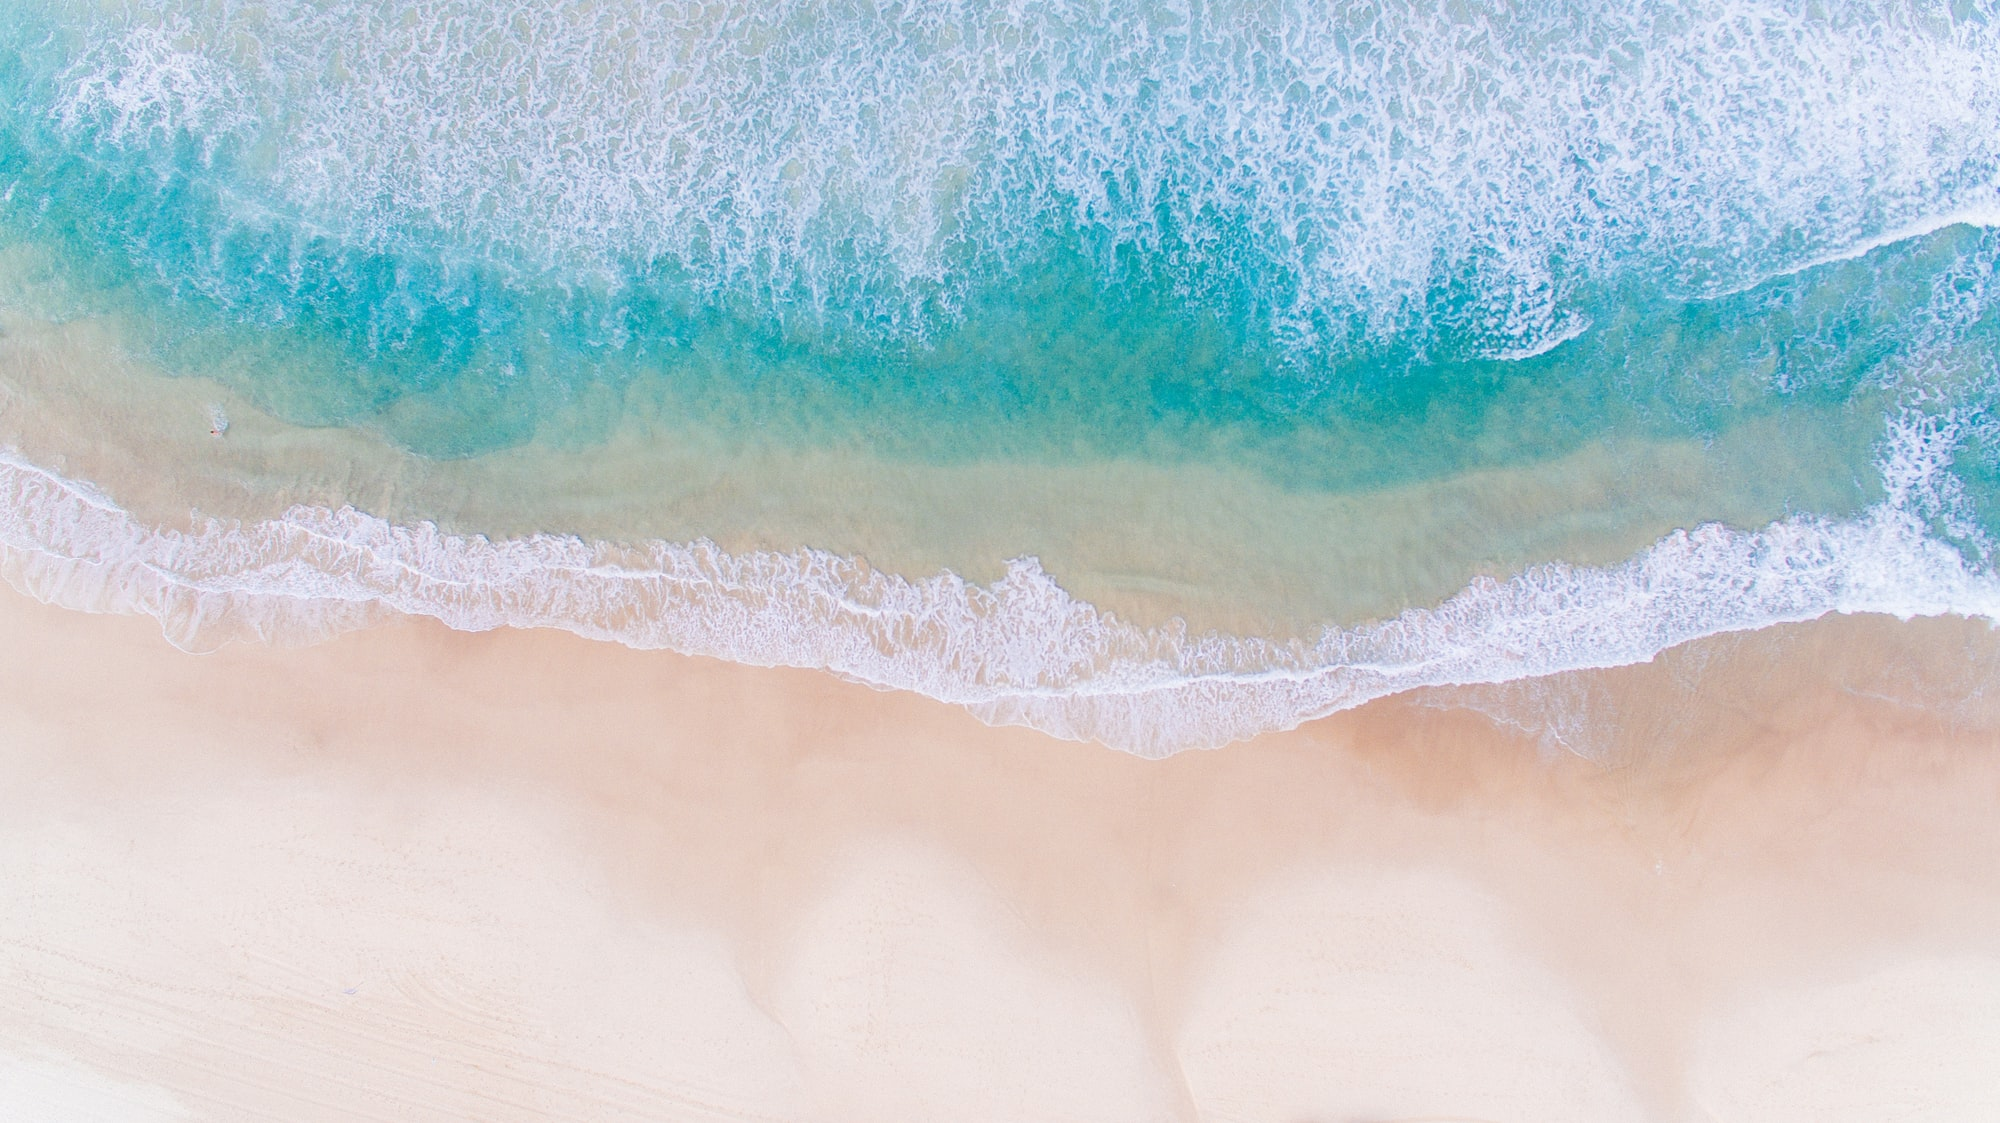 Sea washing ashore drone view